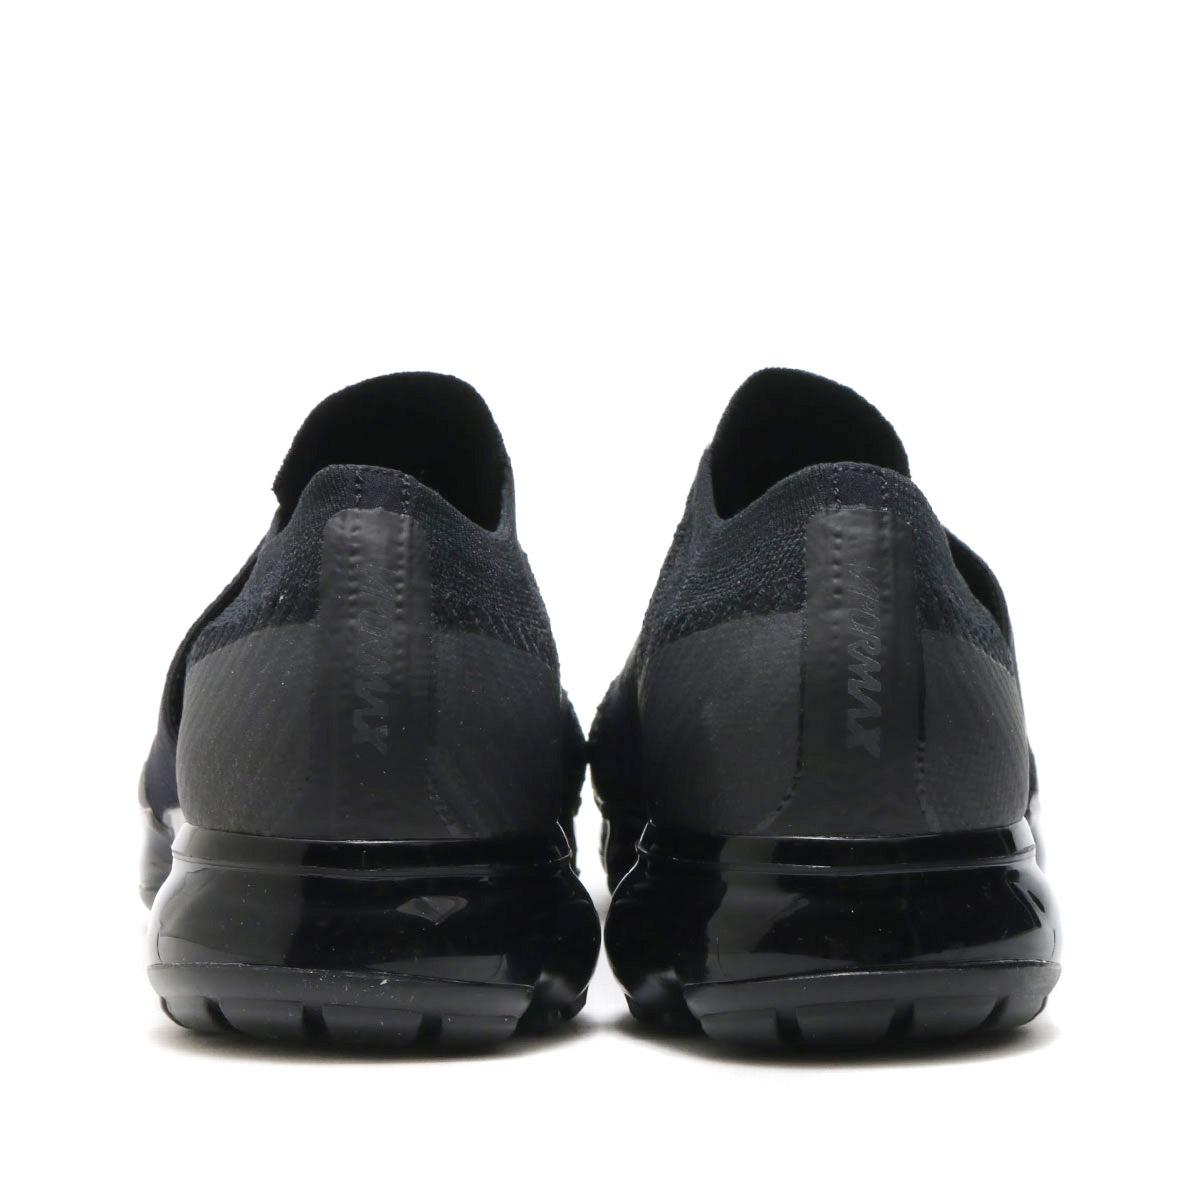 e8fb73c63d8 NIKE WMNS AIR VAPORMAX FK MOC (Nike women air vapor max fried food knit  mock) (BLACK ANTHRACITE) 18SP-S